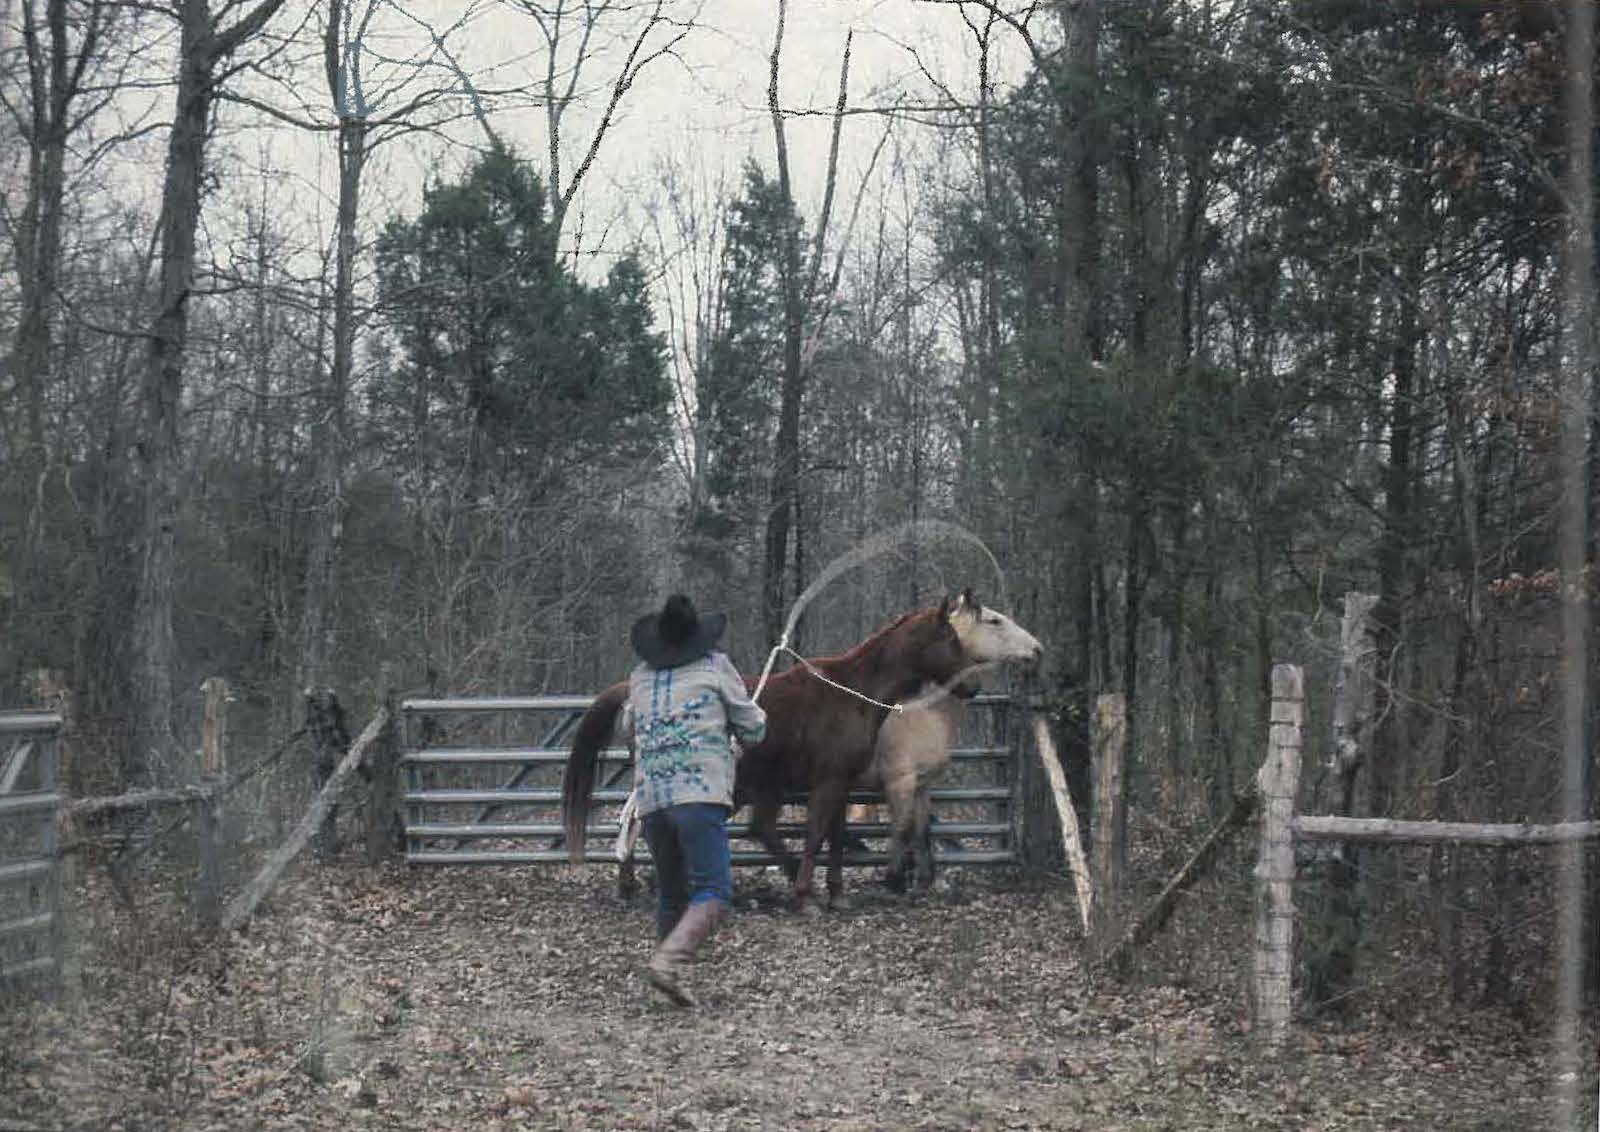 Charlie Daniels roping horses